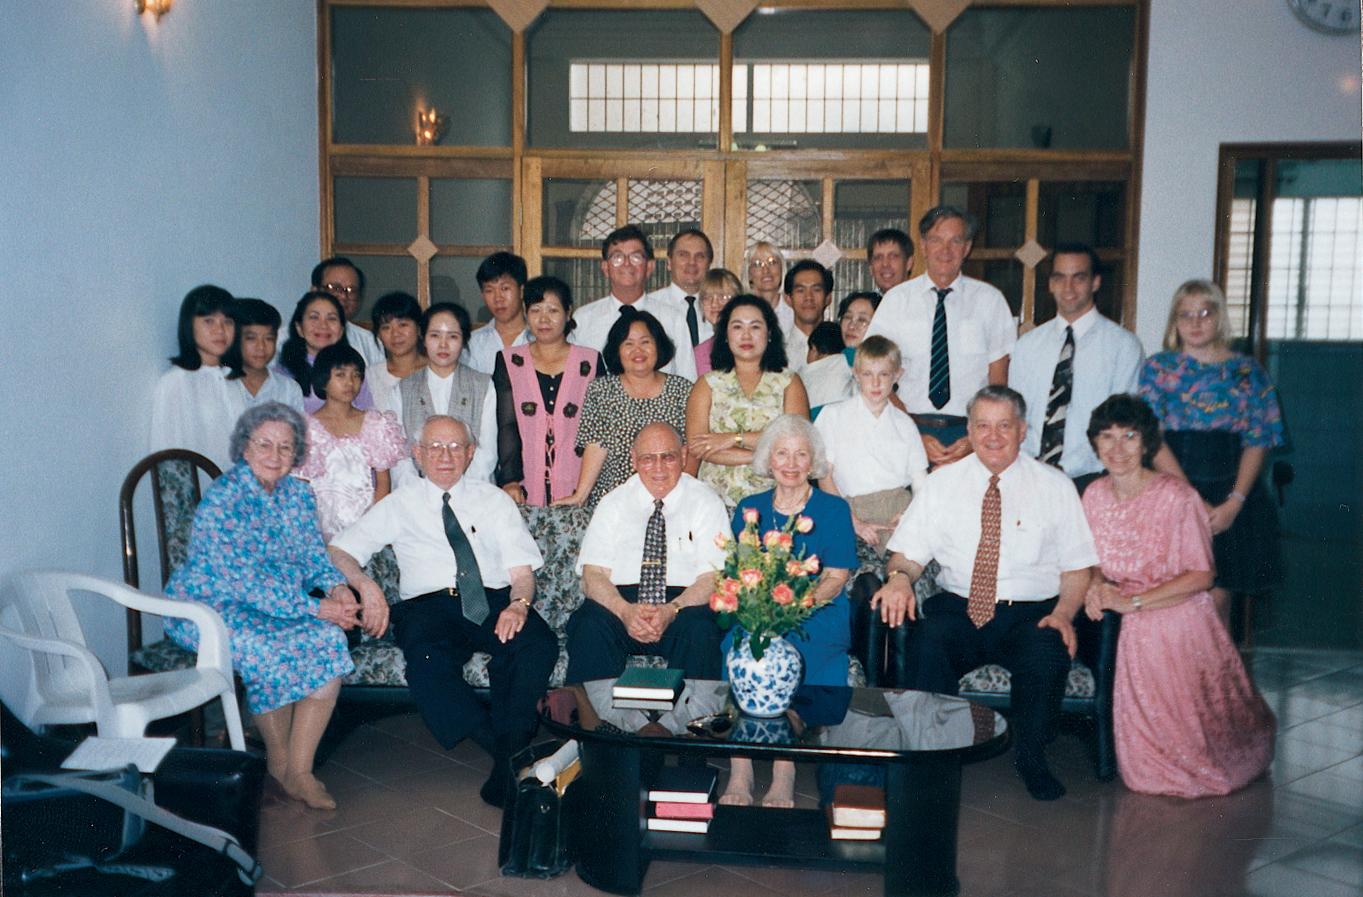 President Gordon B. Hinckley and his wife, Sister Marjorie Pay Hinckley, visit Vietnam in 1996.